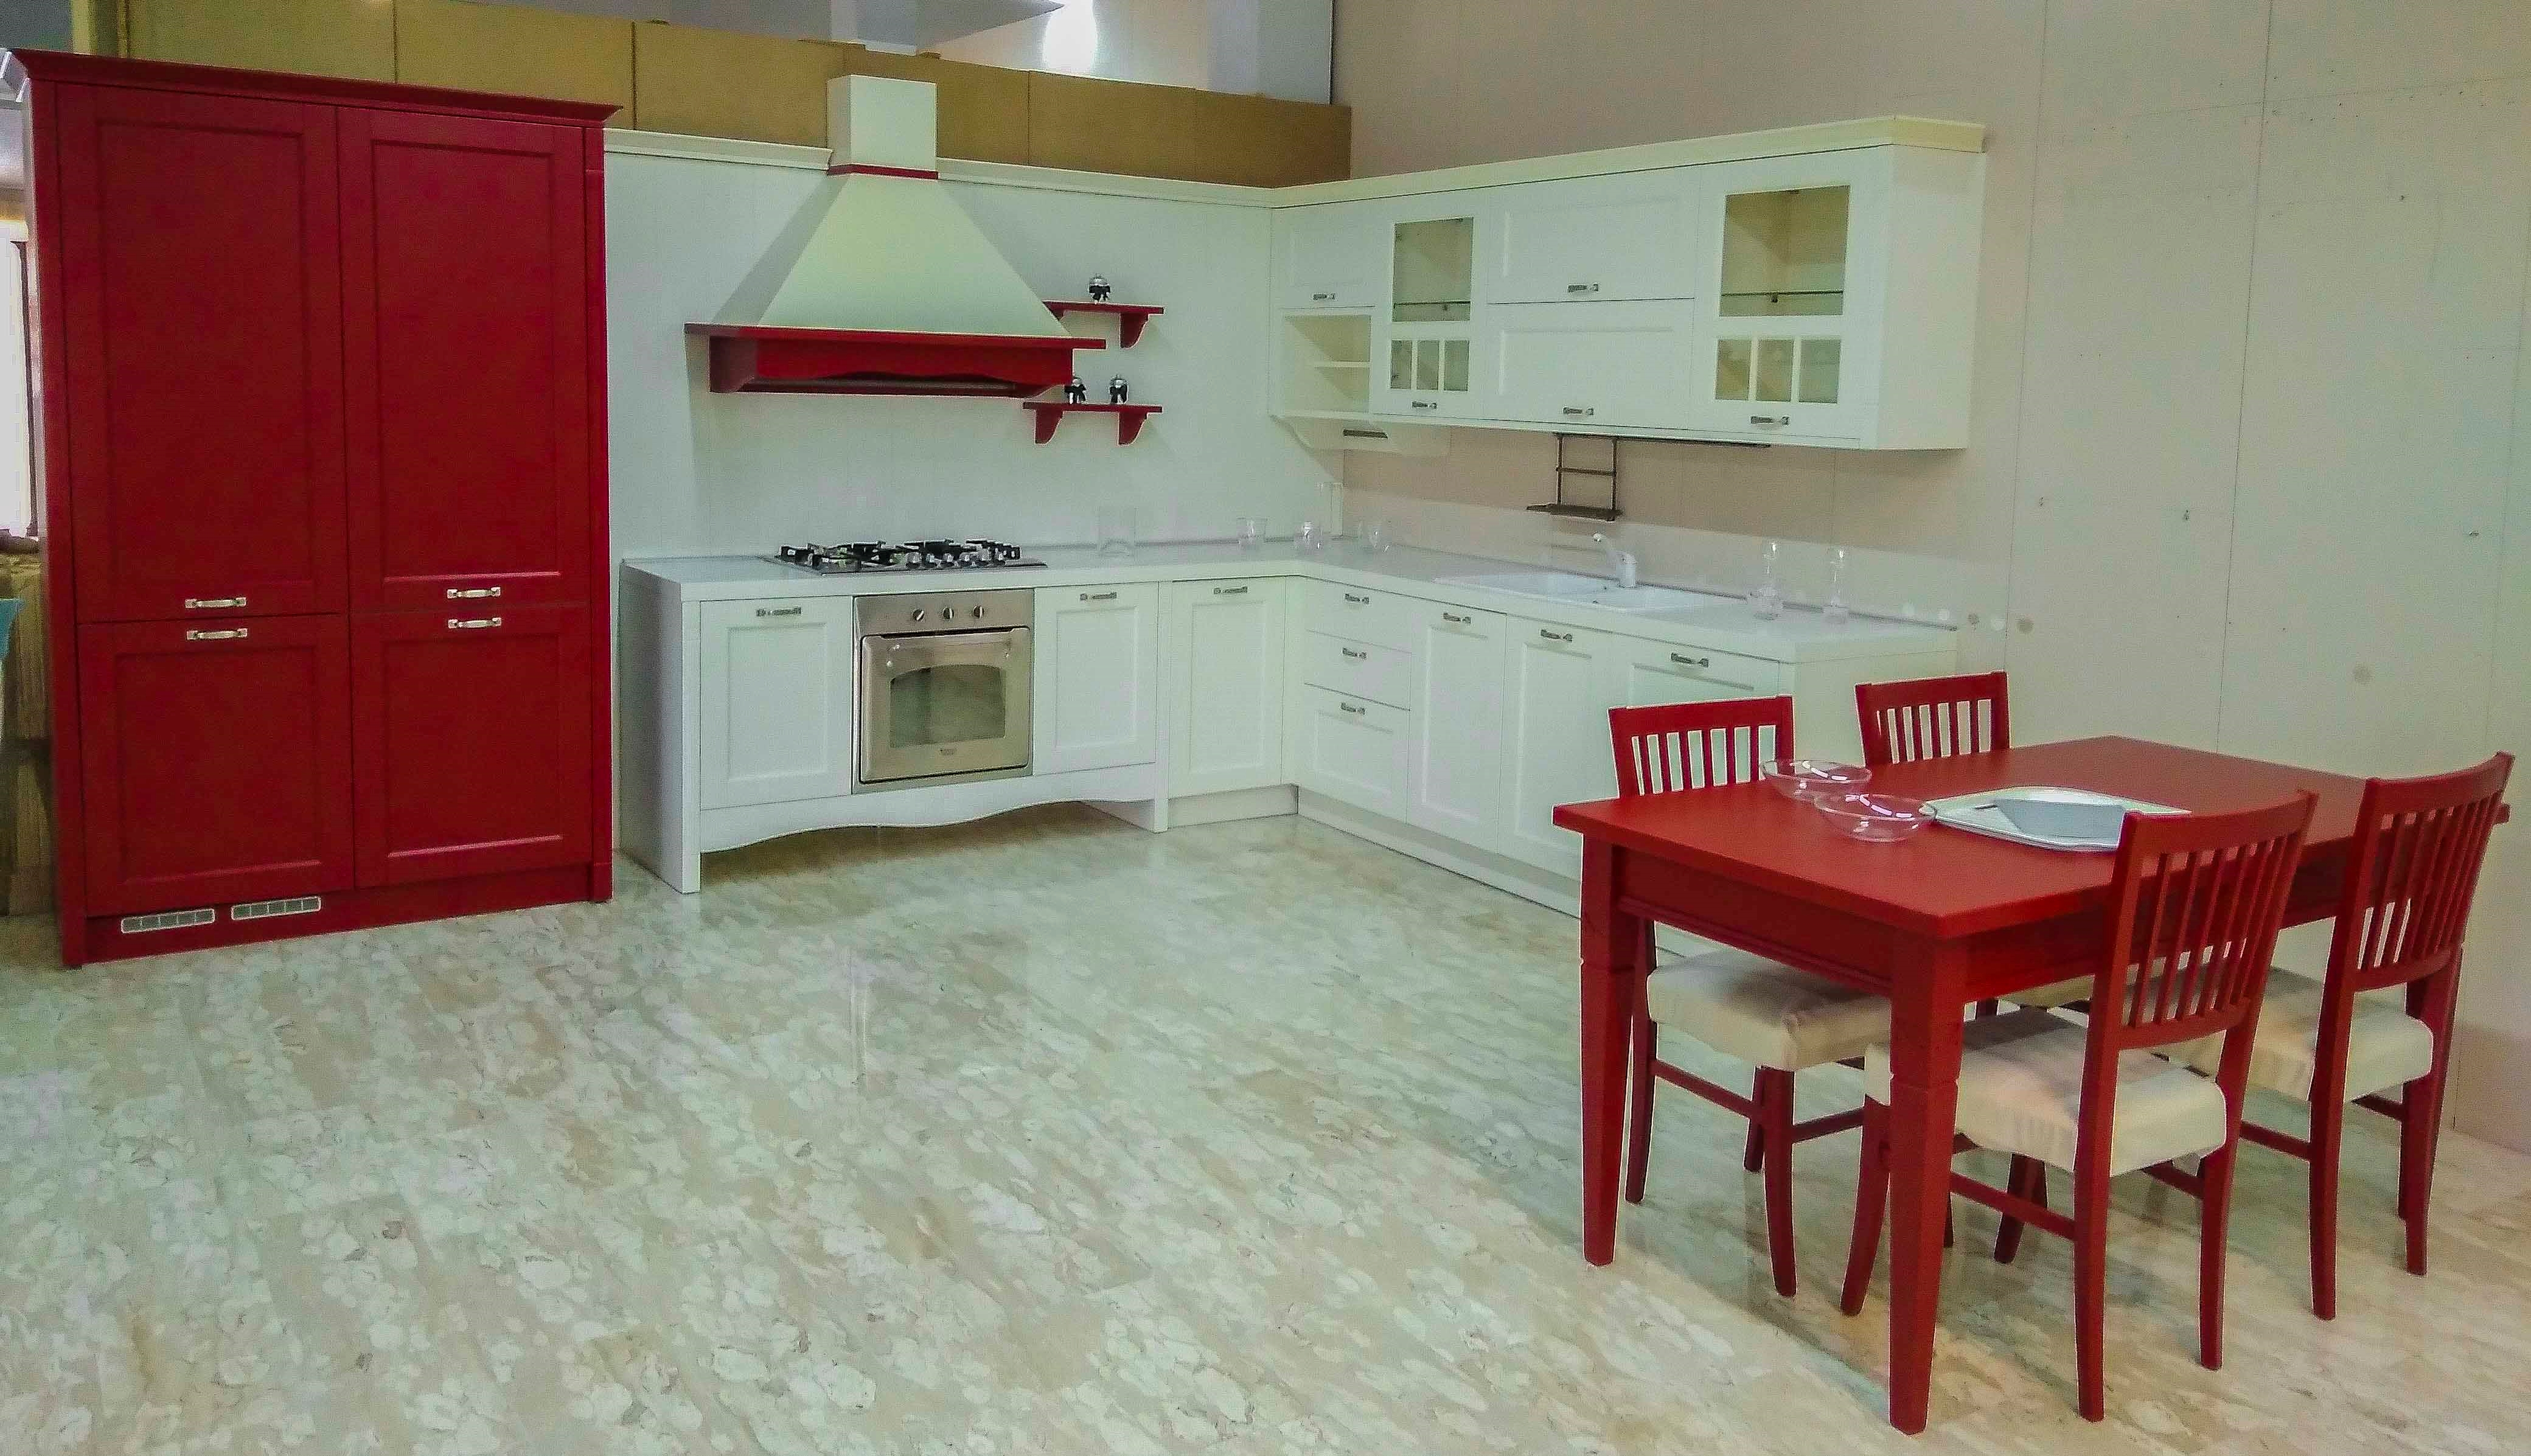 Veneta cucine cucina gretha scontato del 60 cucine a prezzi scontati - Cucina veneta cucine ...